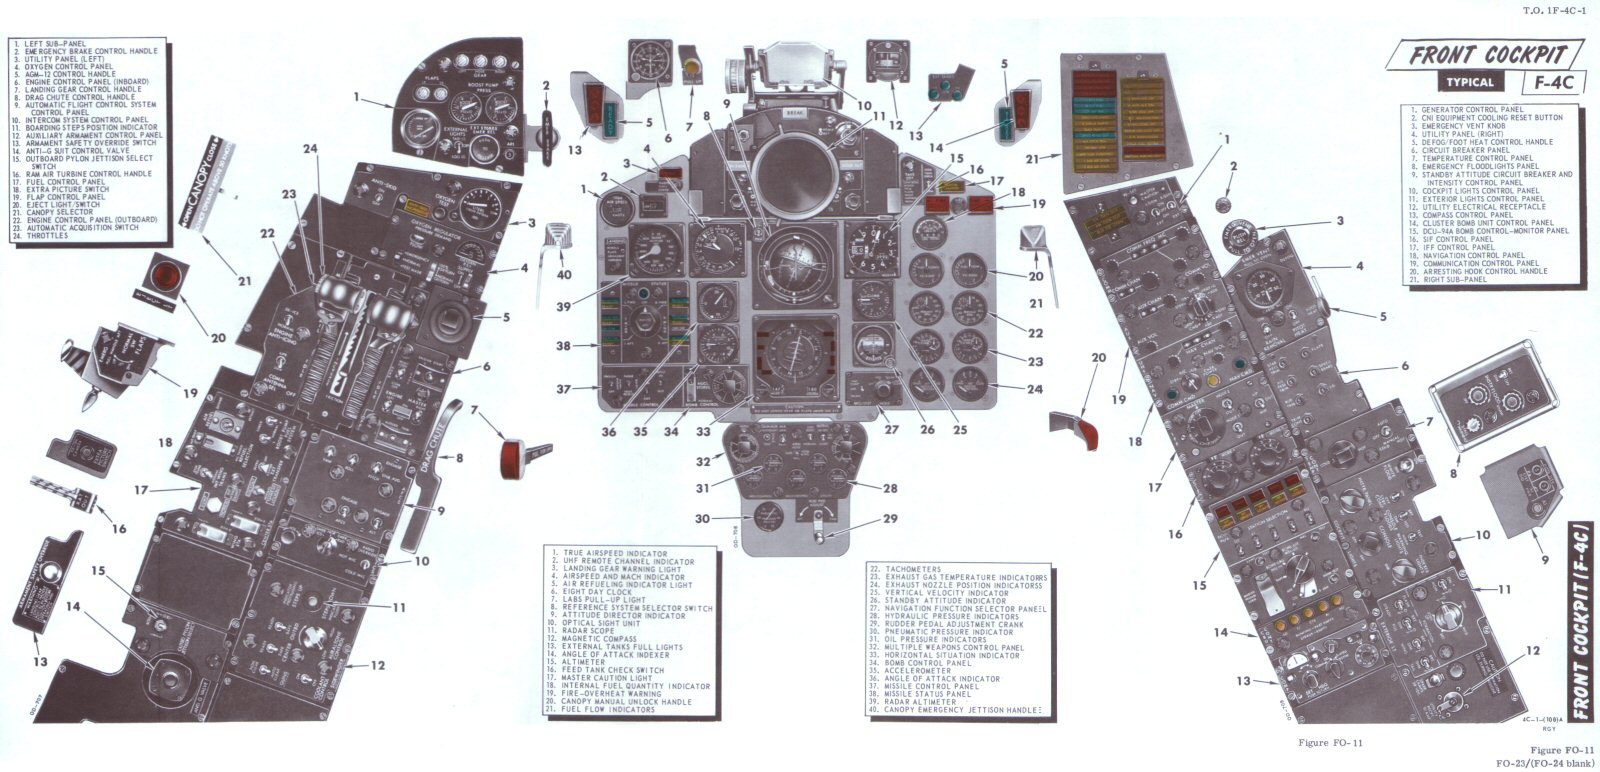 McDonnell F-4C, RF-4C, F-4D and F-4E Phantom II USAF aircraft